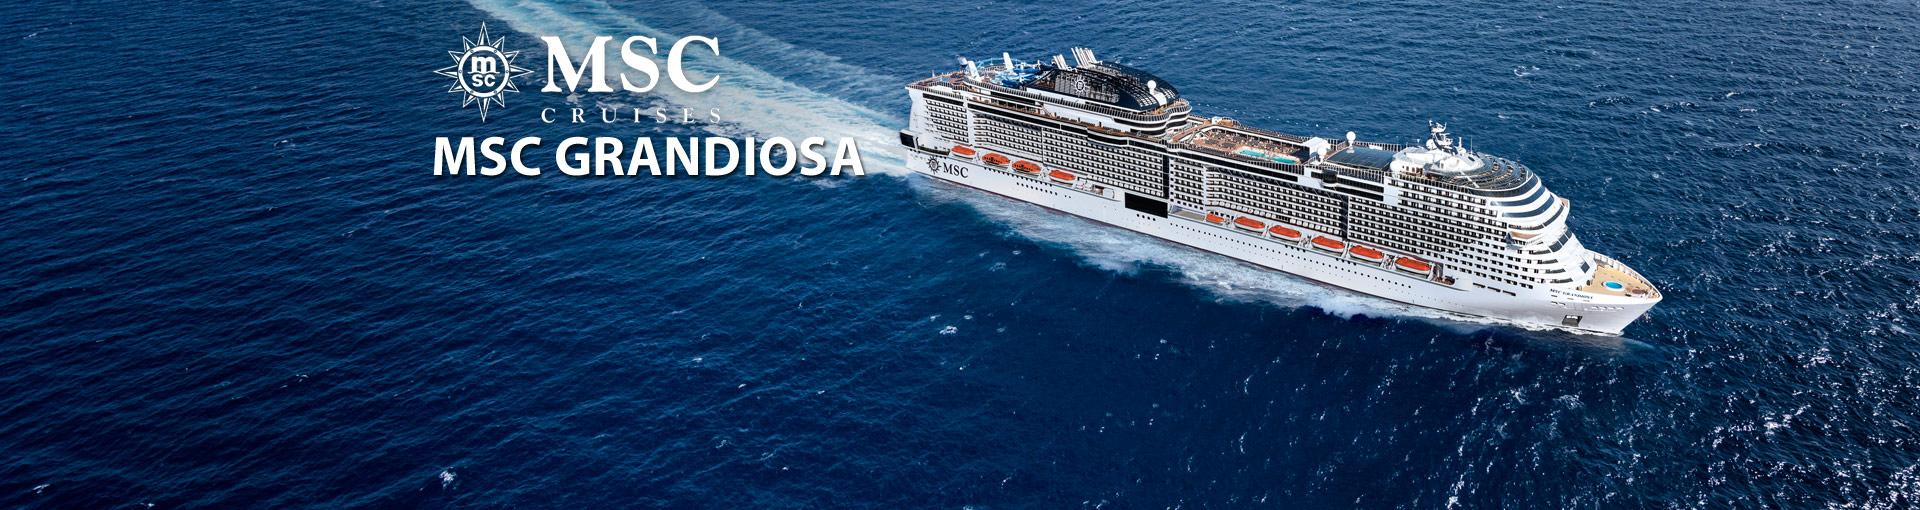 MSC Grandiosa Cruise Ship, 2019, 2020 and 2021 MSC ...